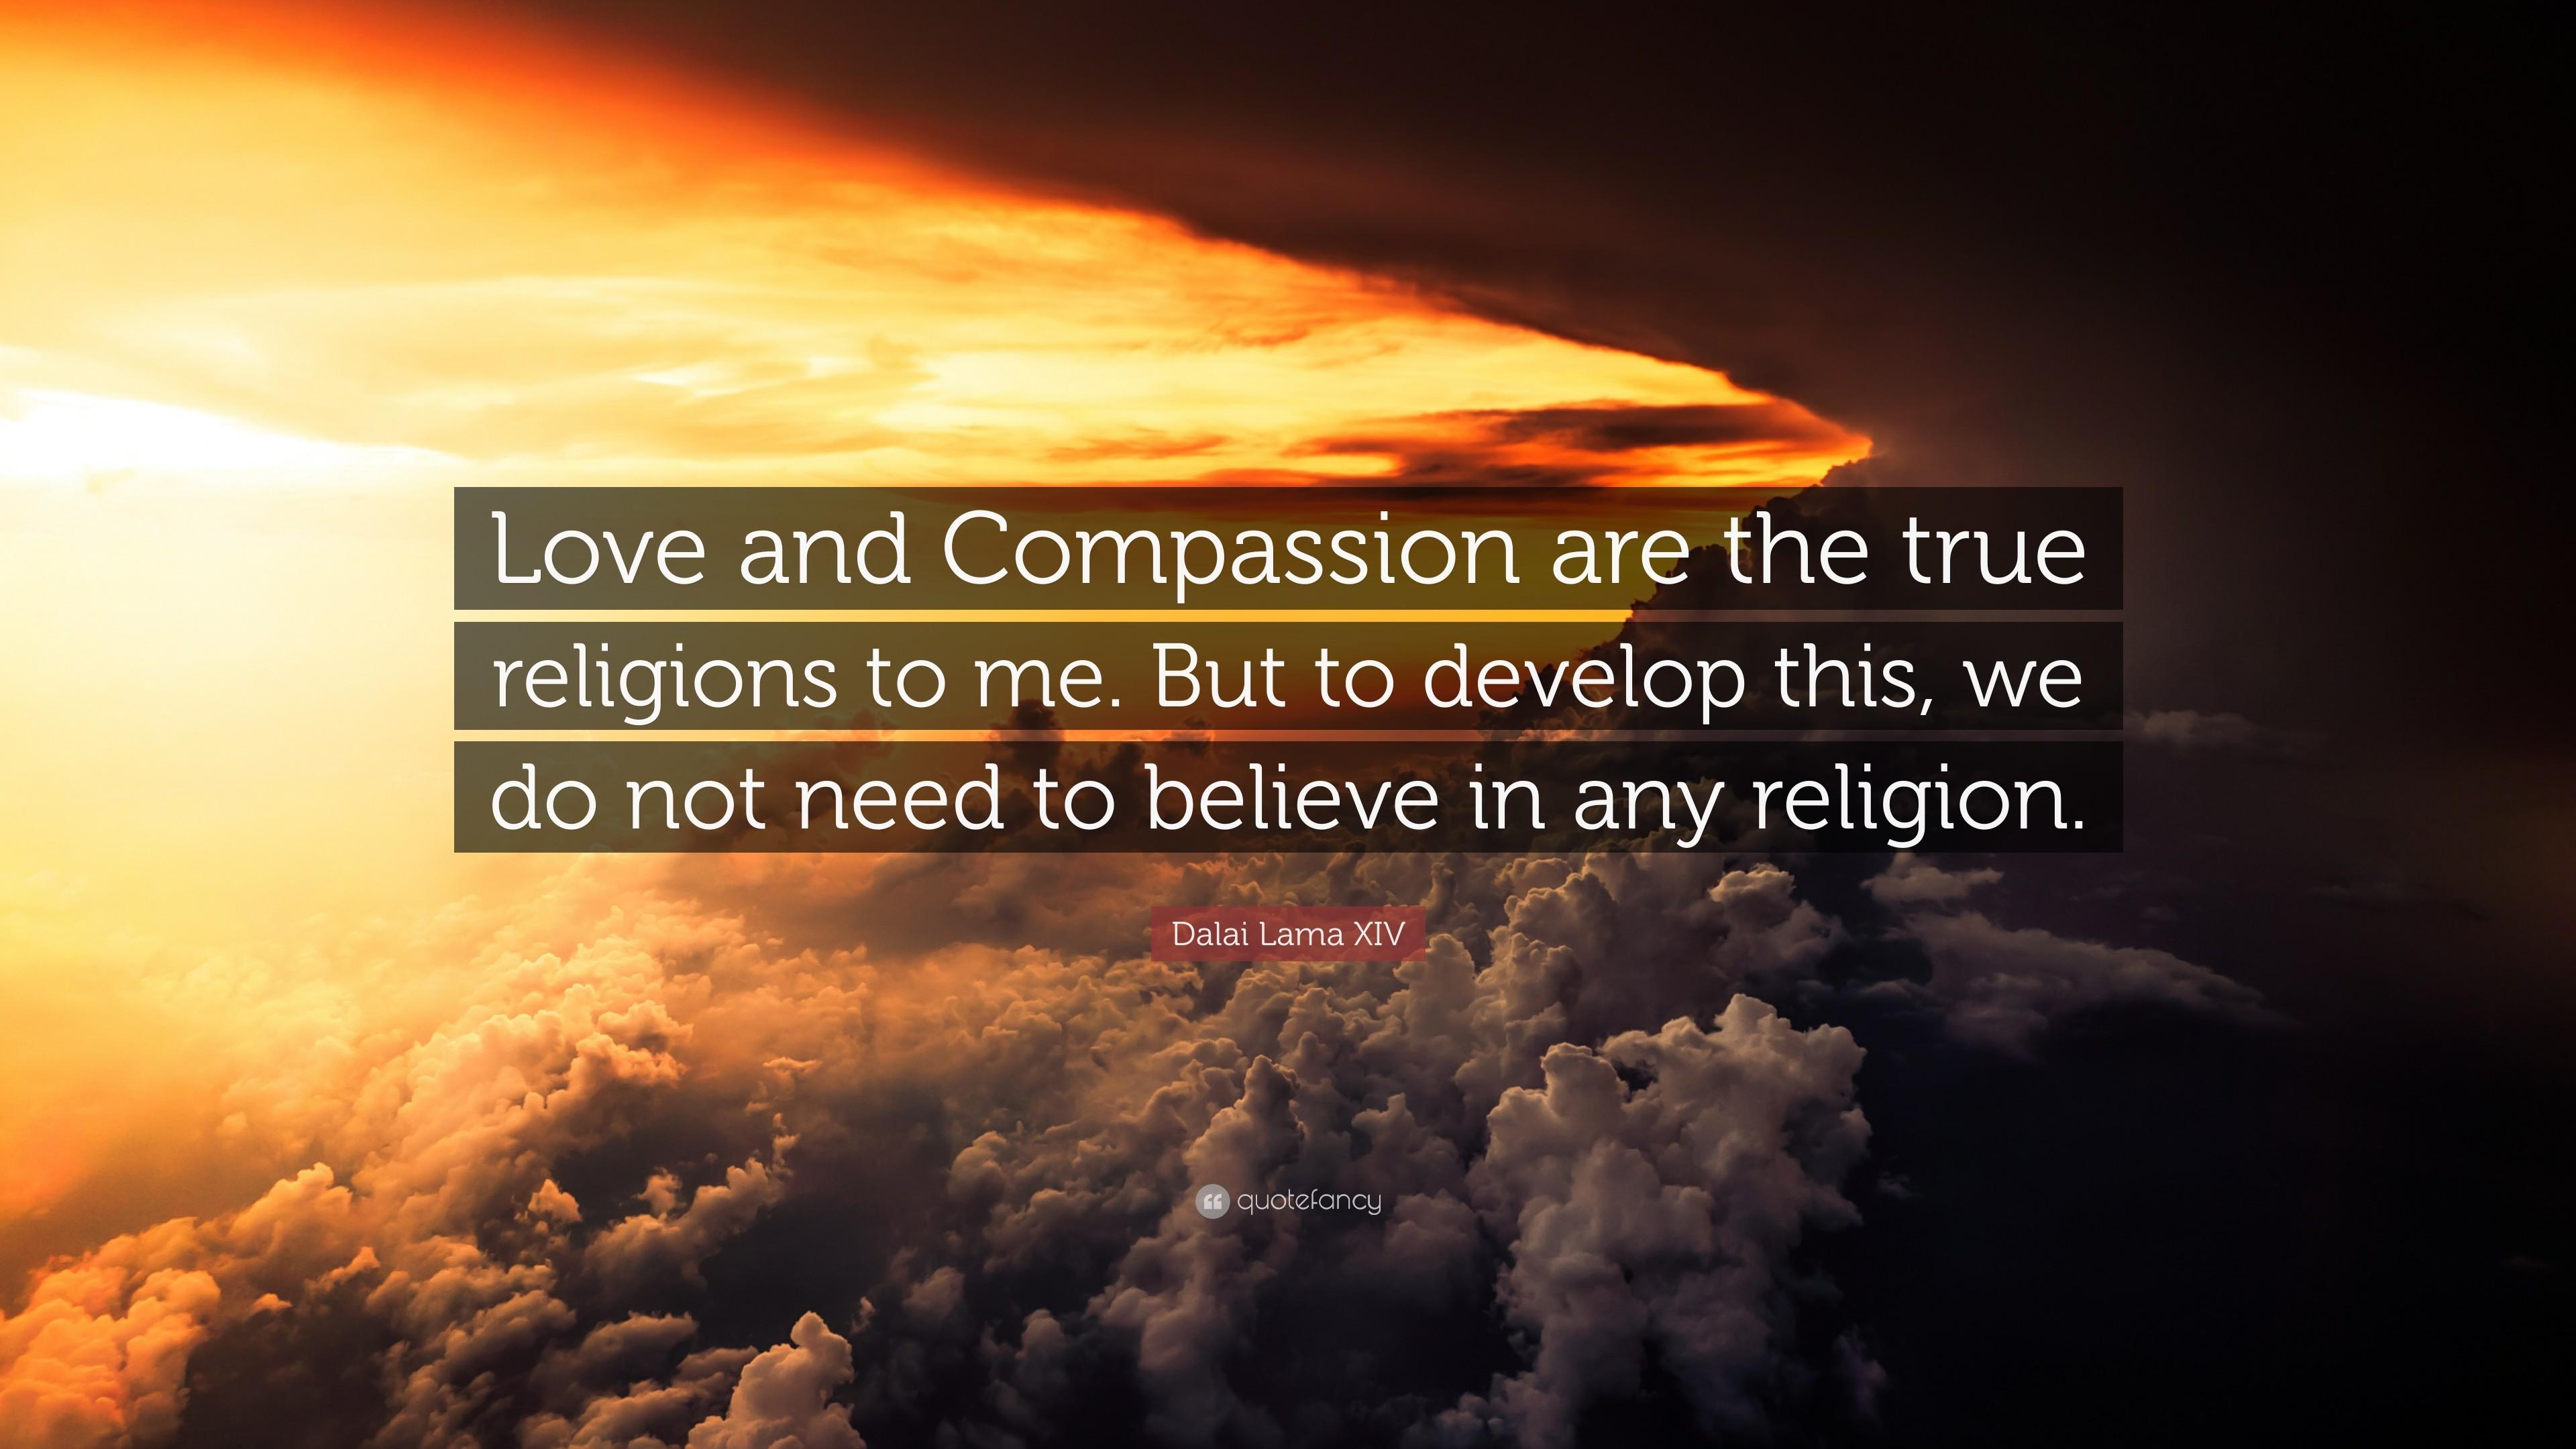 "Dalai Lama XIV Quote: ""Love and Compassion are the true religions to me."